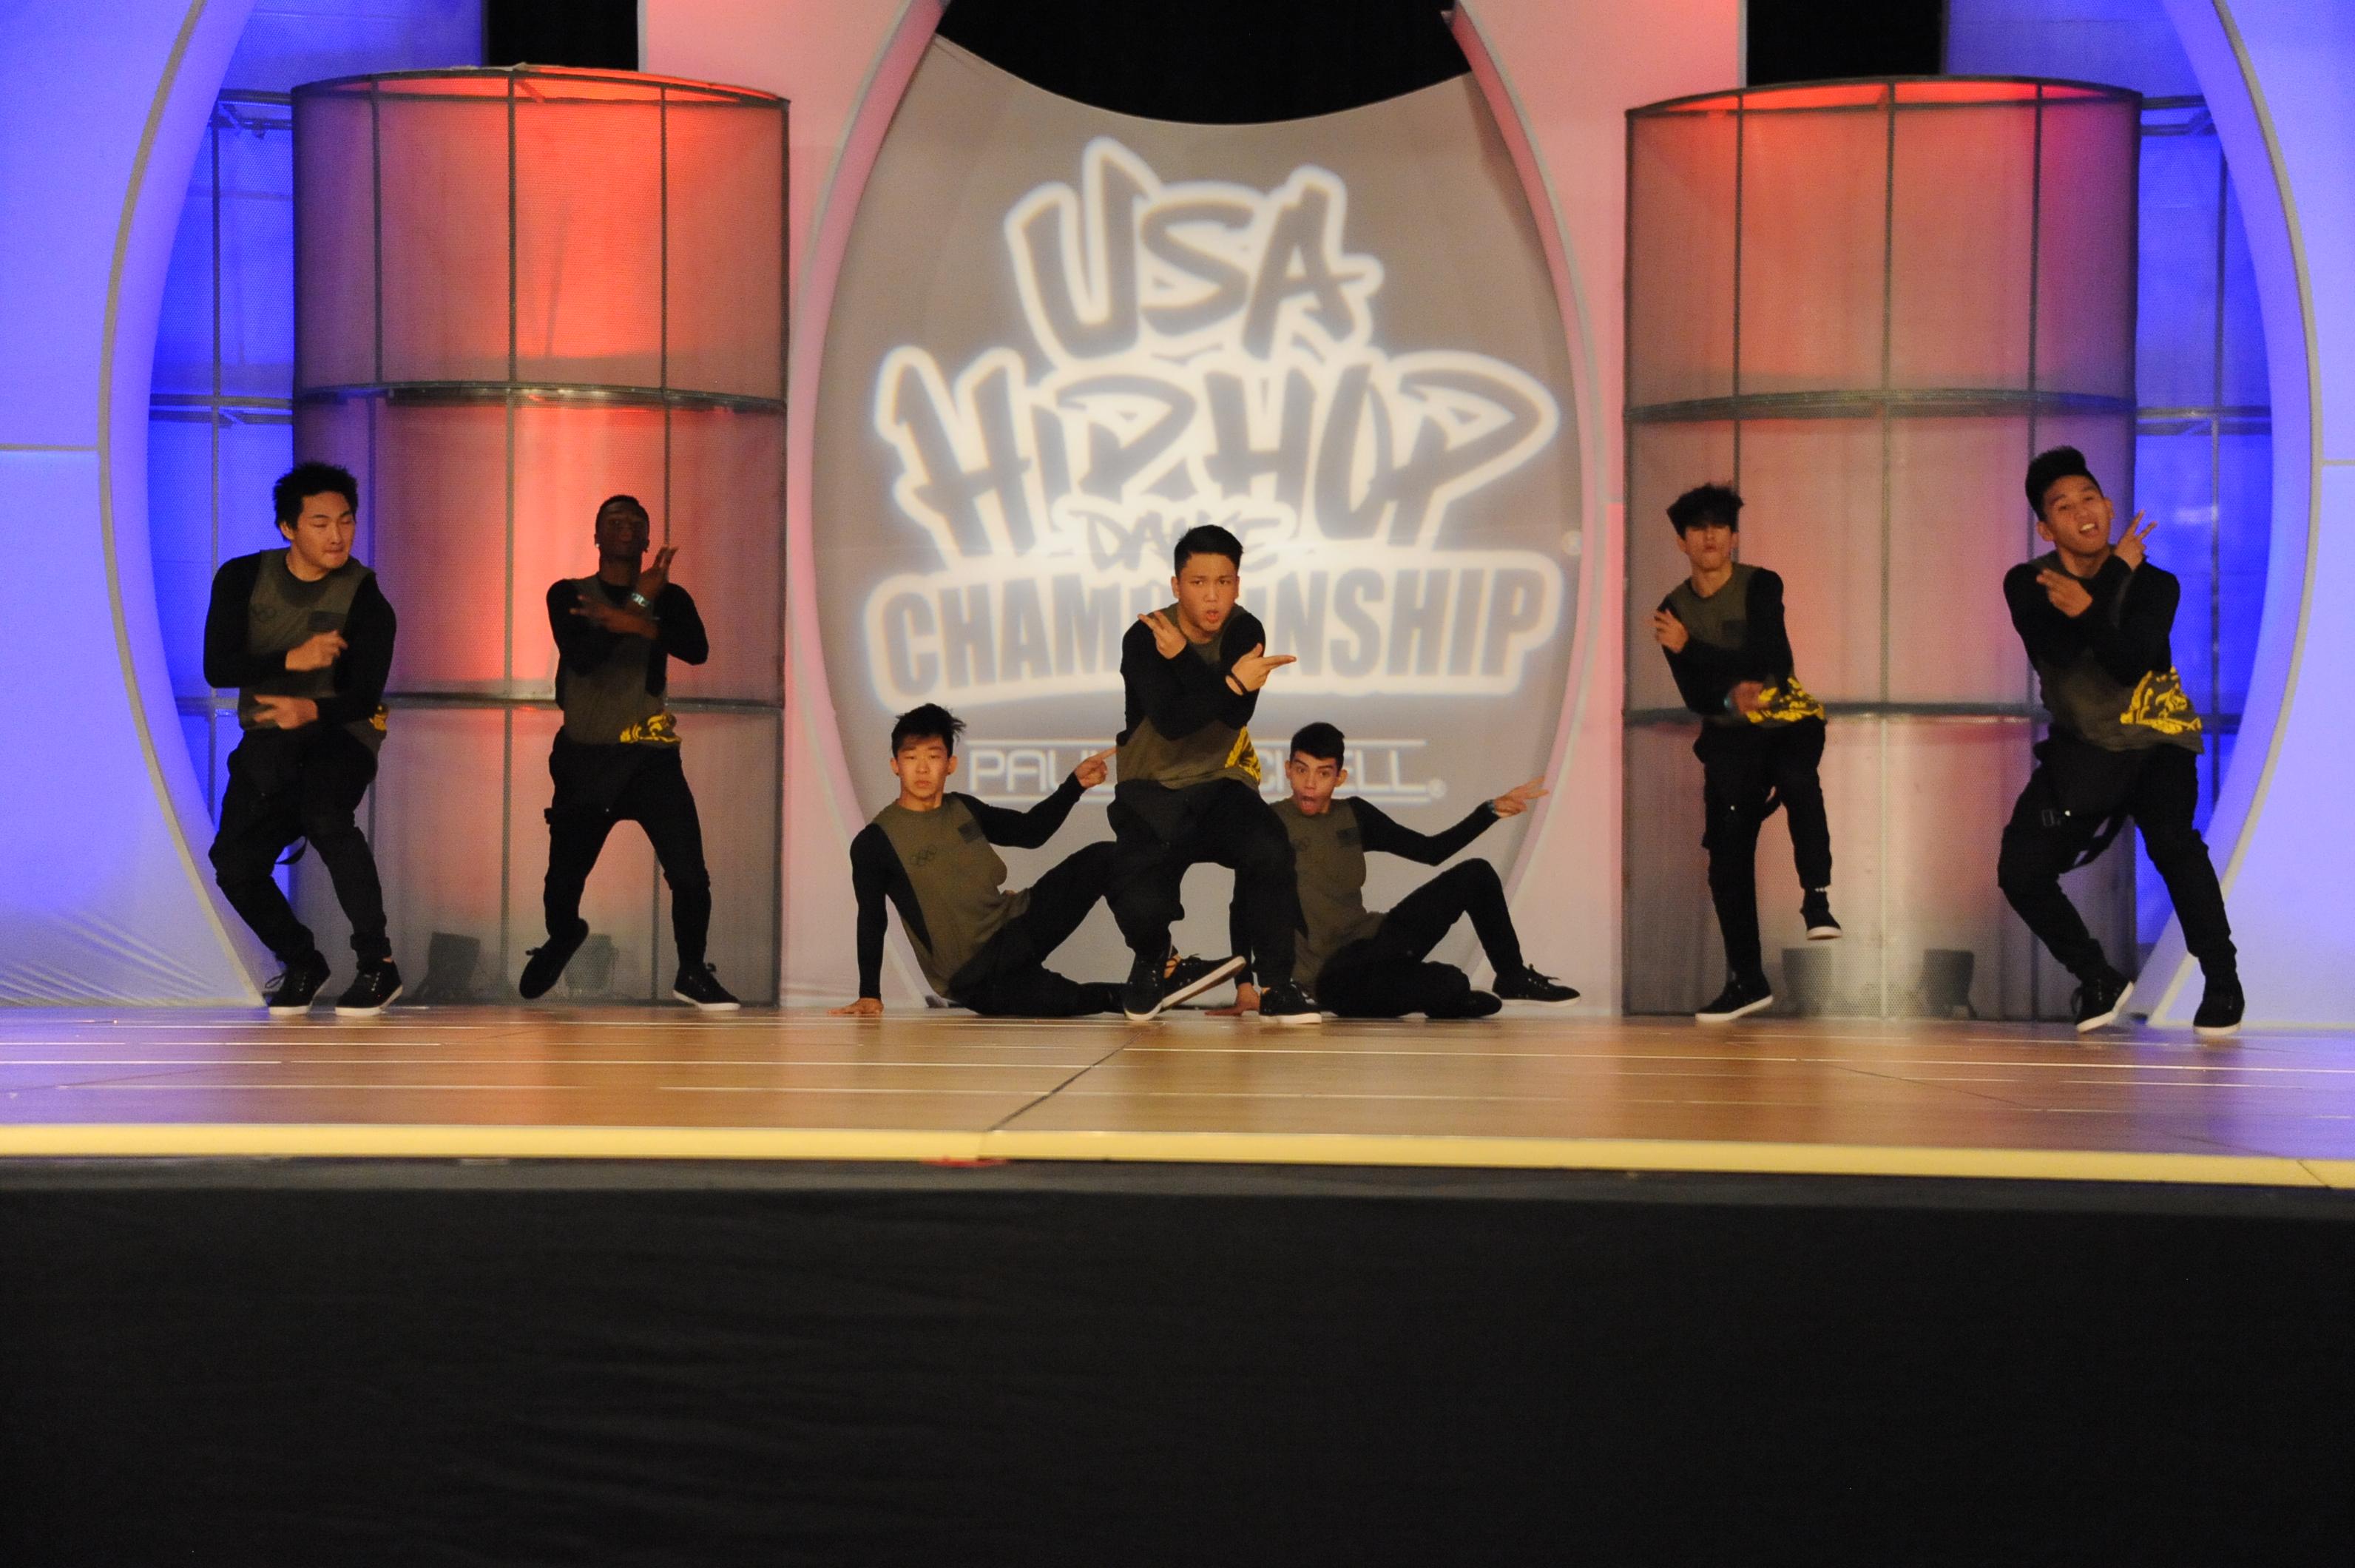 USA_V_Brobots Dance Crew_grp1